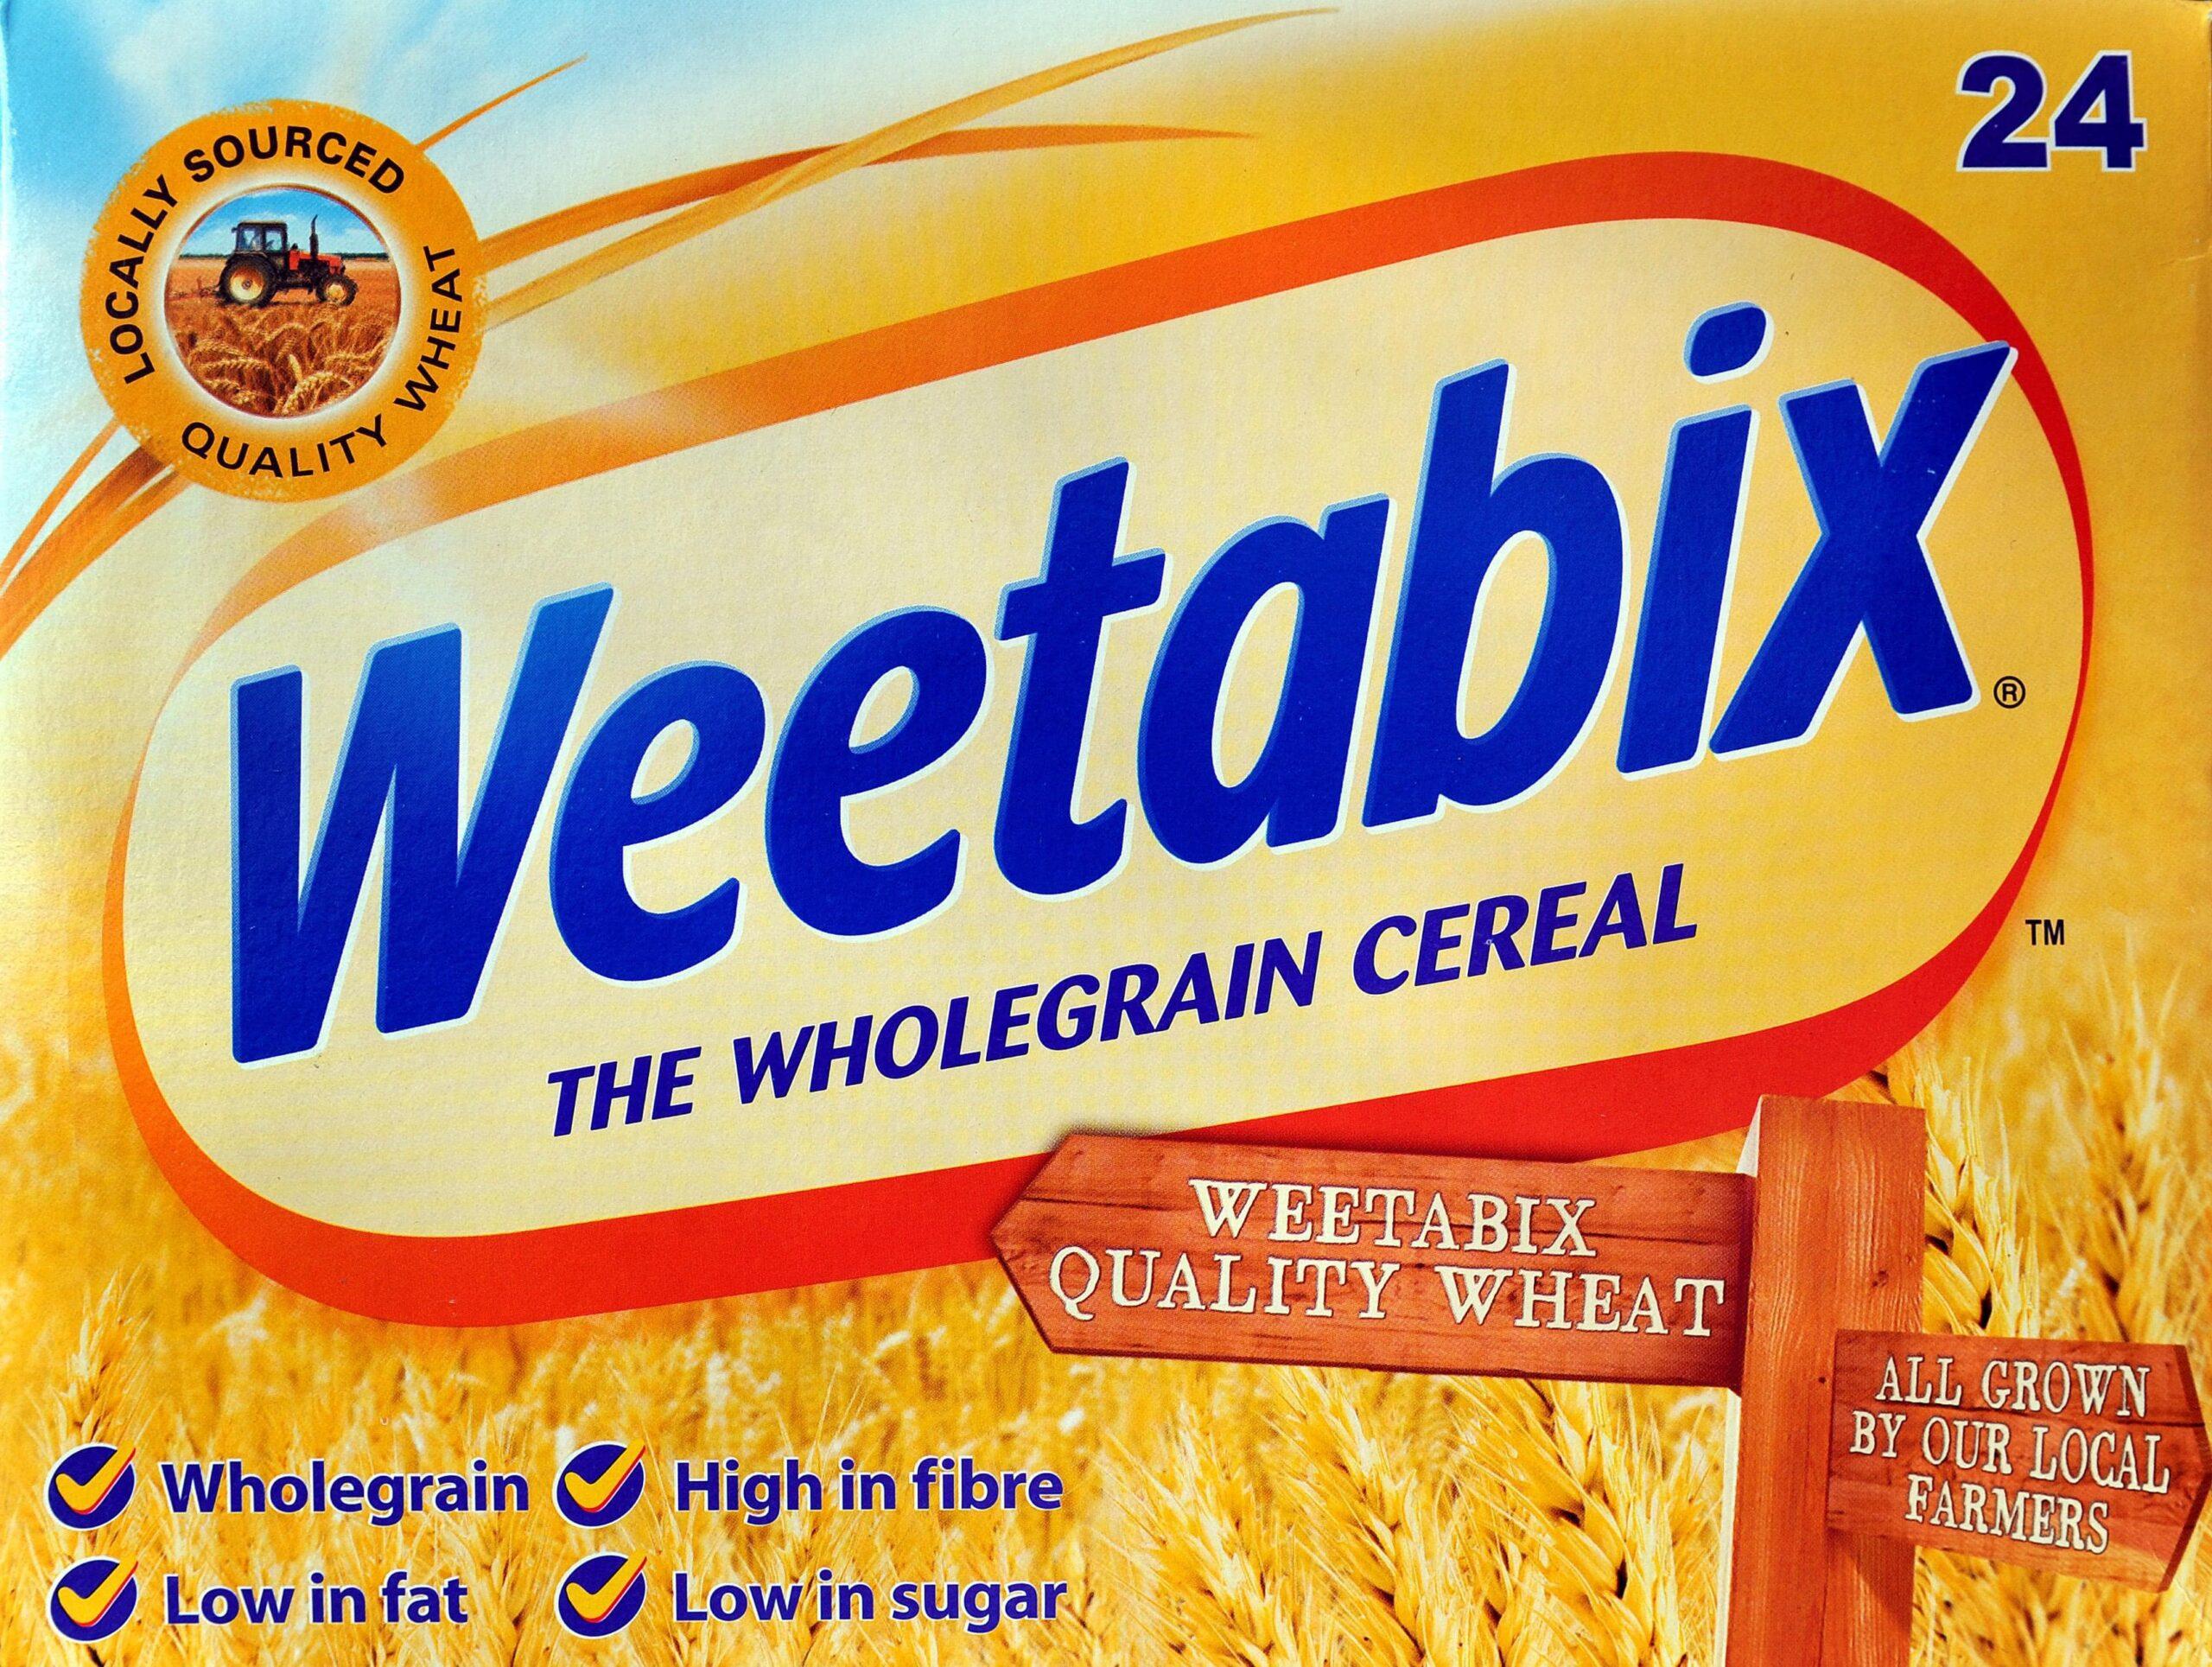 Weetabix Baked Beans